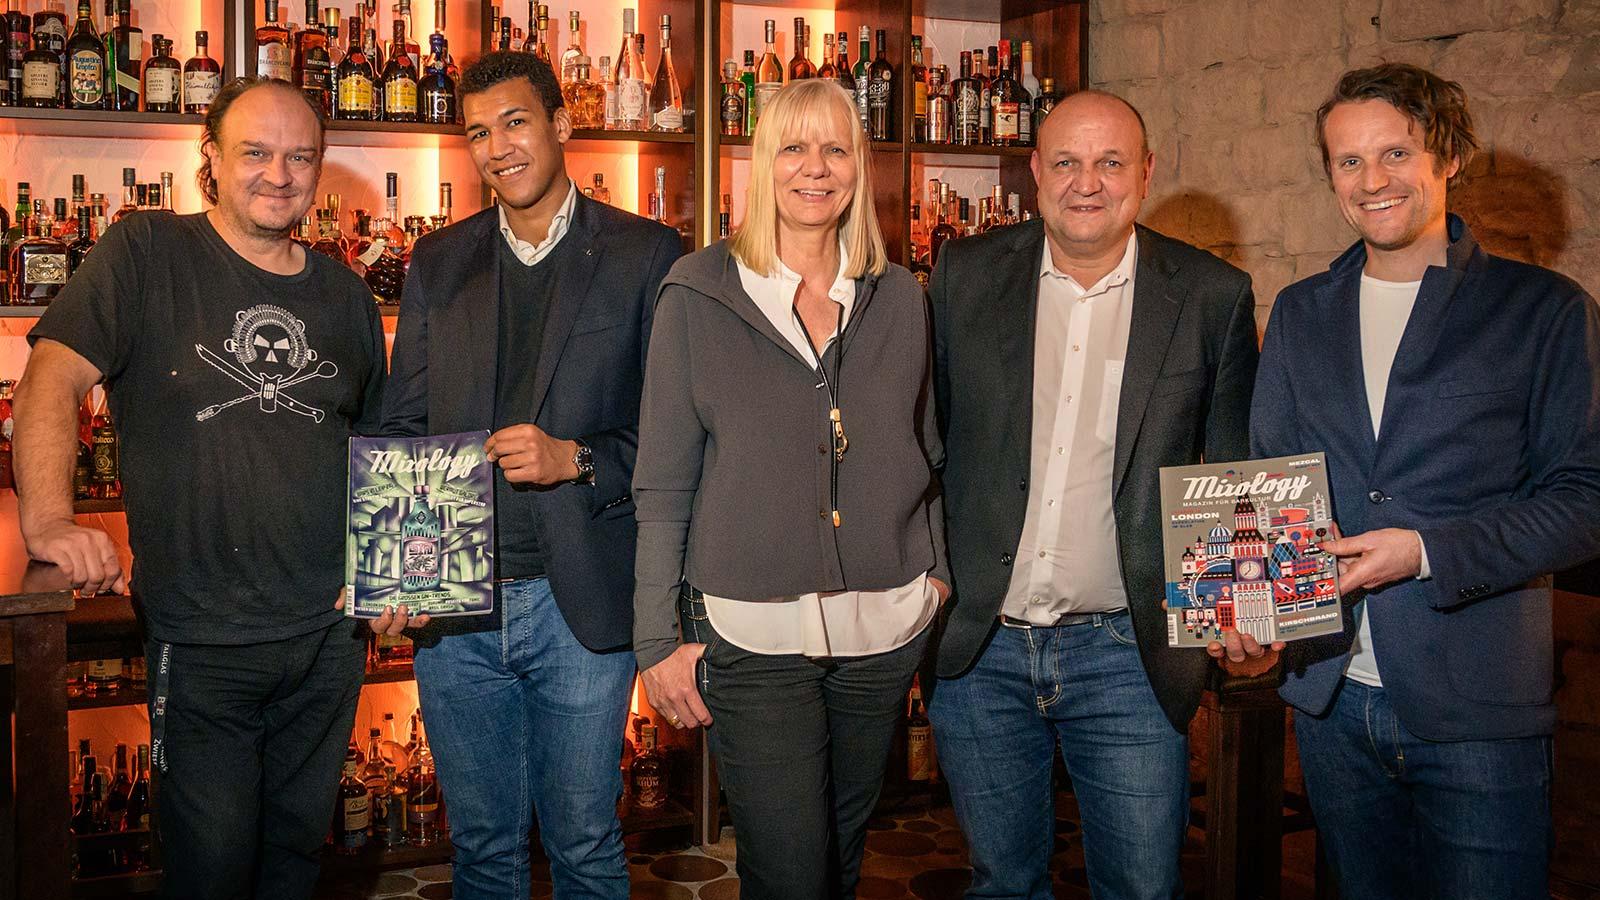 Meininger Verlag übernimmt Mixology